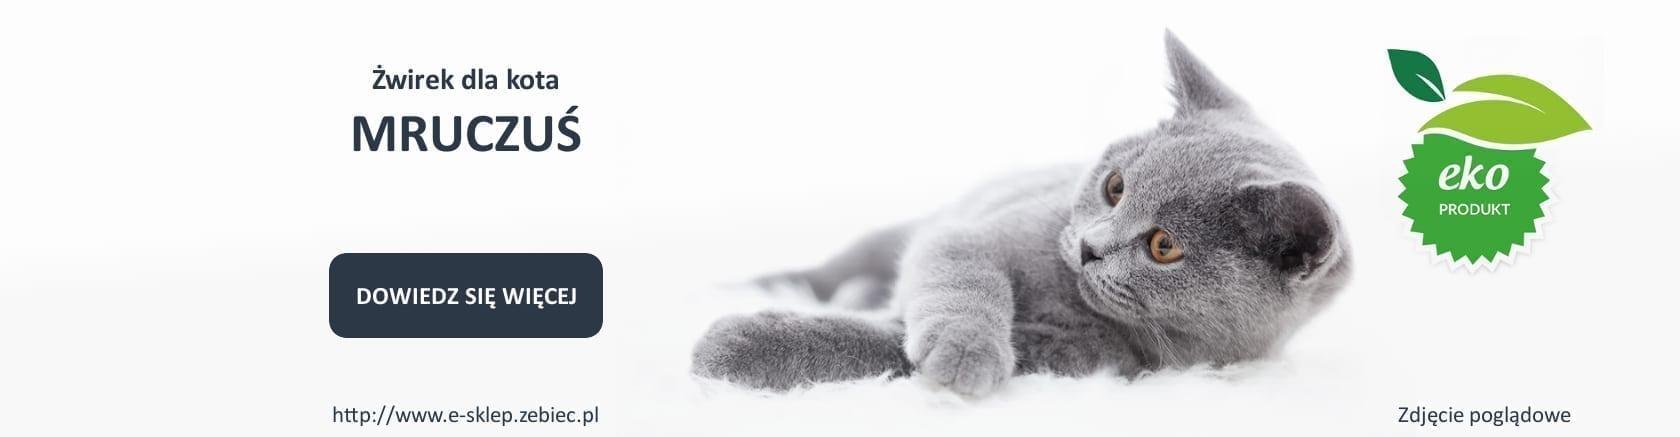 baner żwirku dla kota